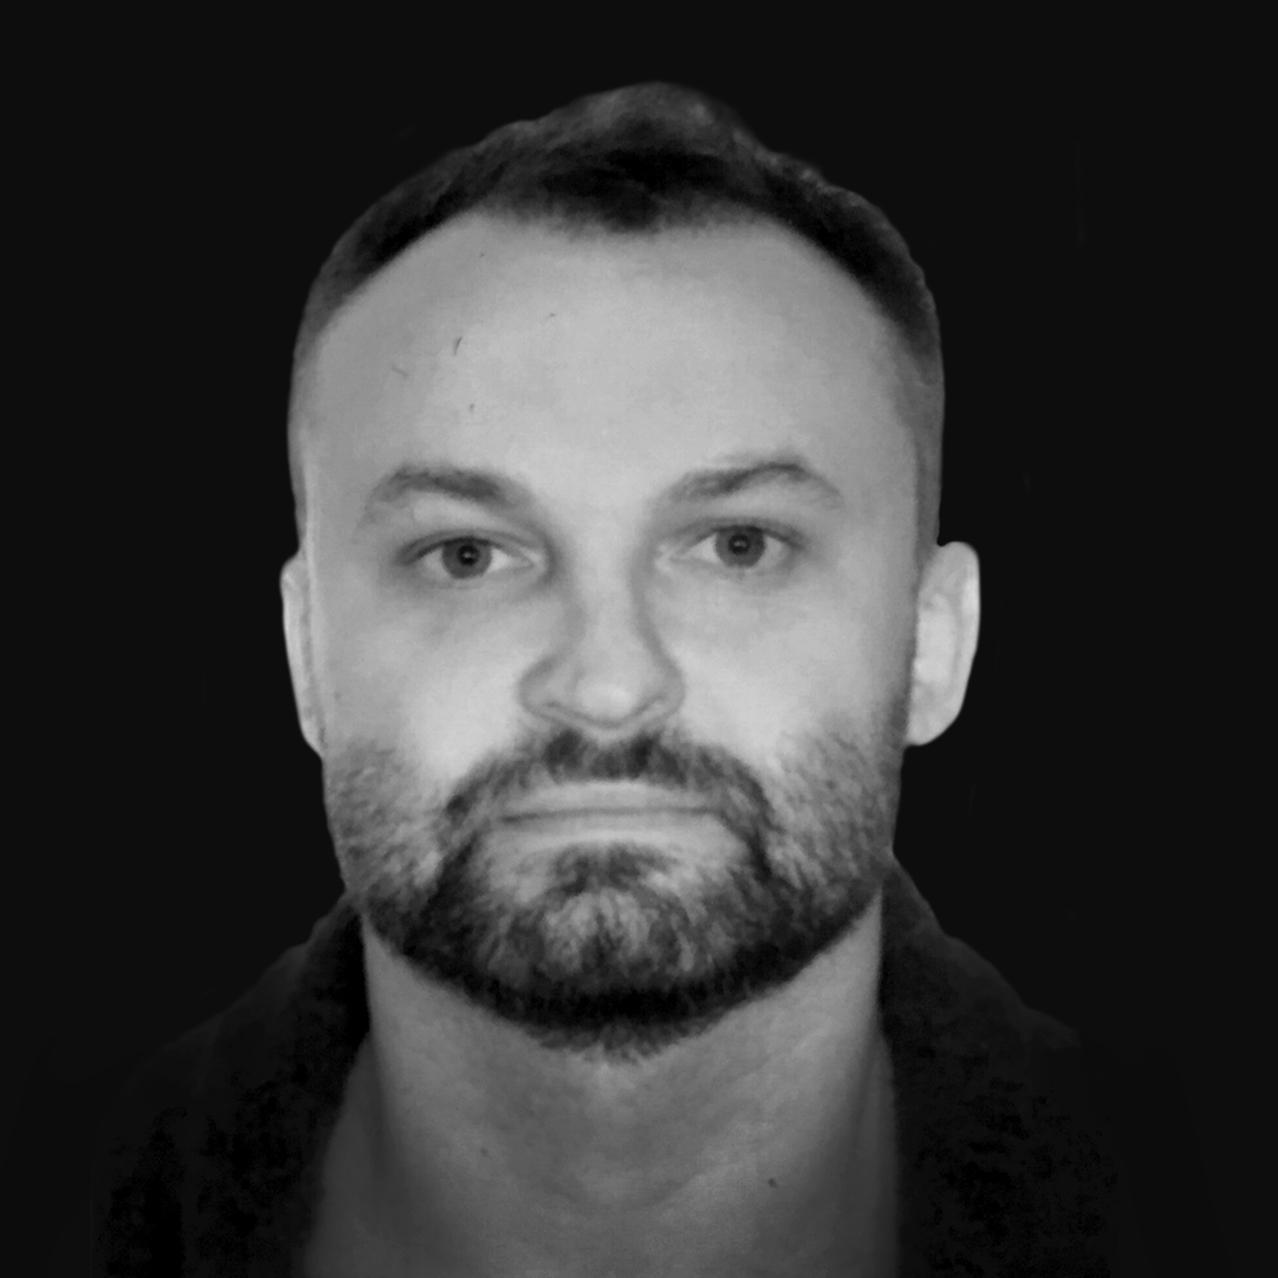 KIRIL KITOV